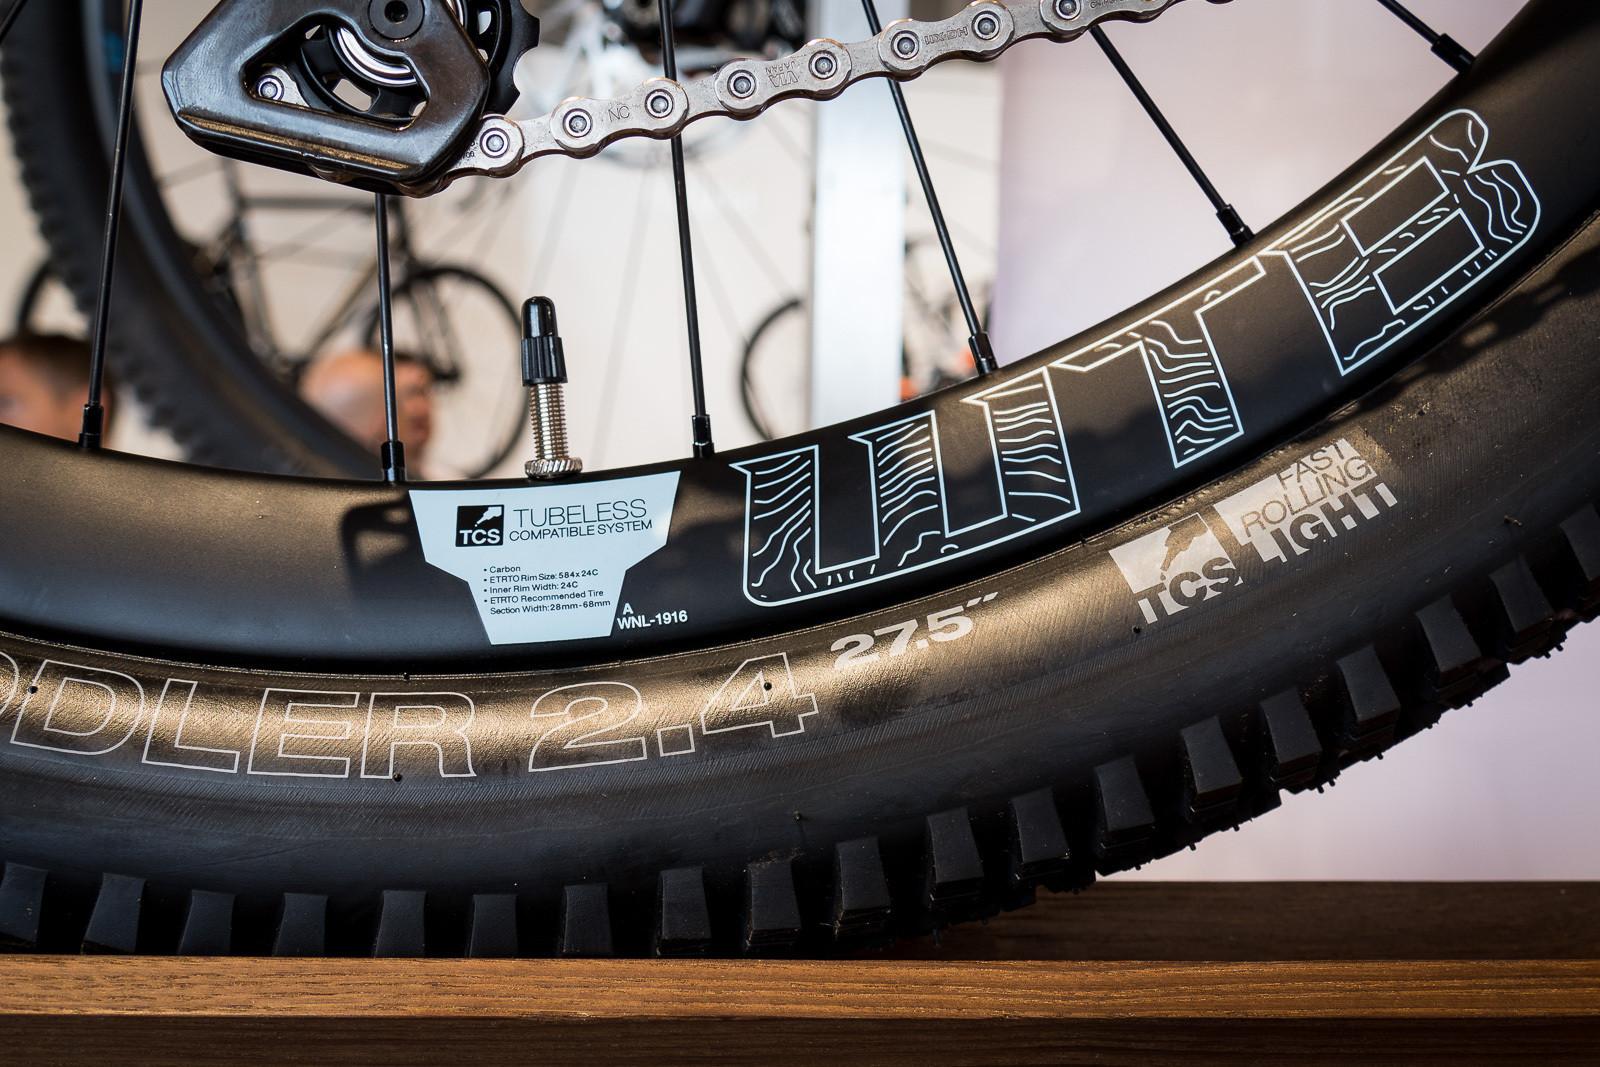 WTB Ci24 Carbon Rims - 2016 Mountain Bike Components at Eurobike - Mountain Biking Pictures - Vital MTB